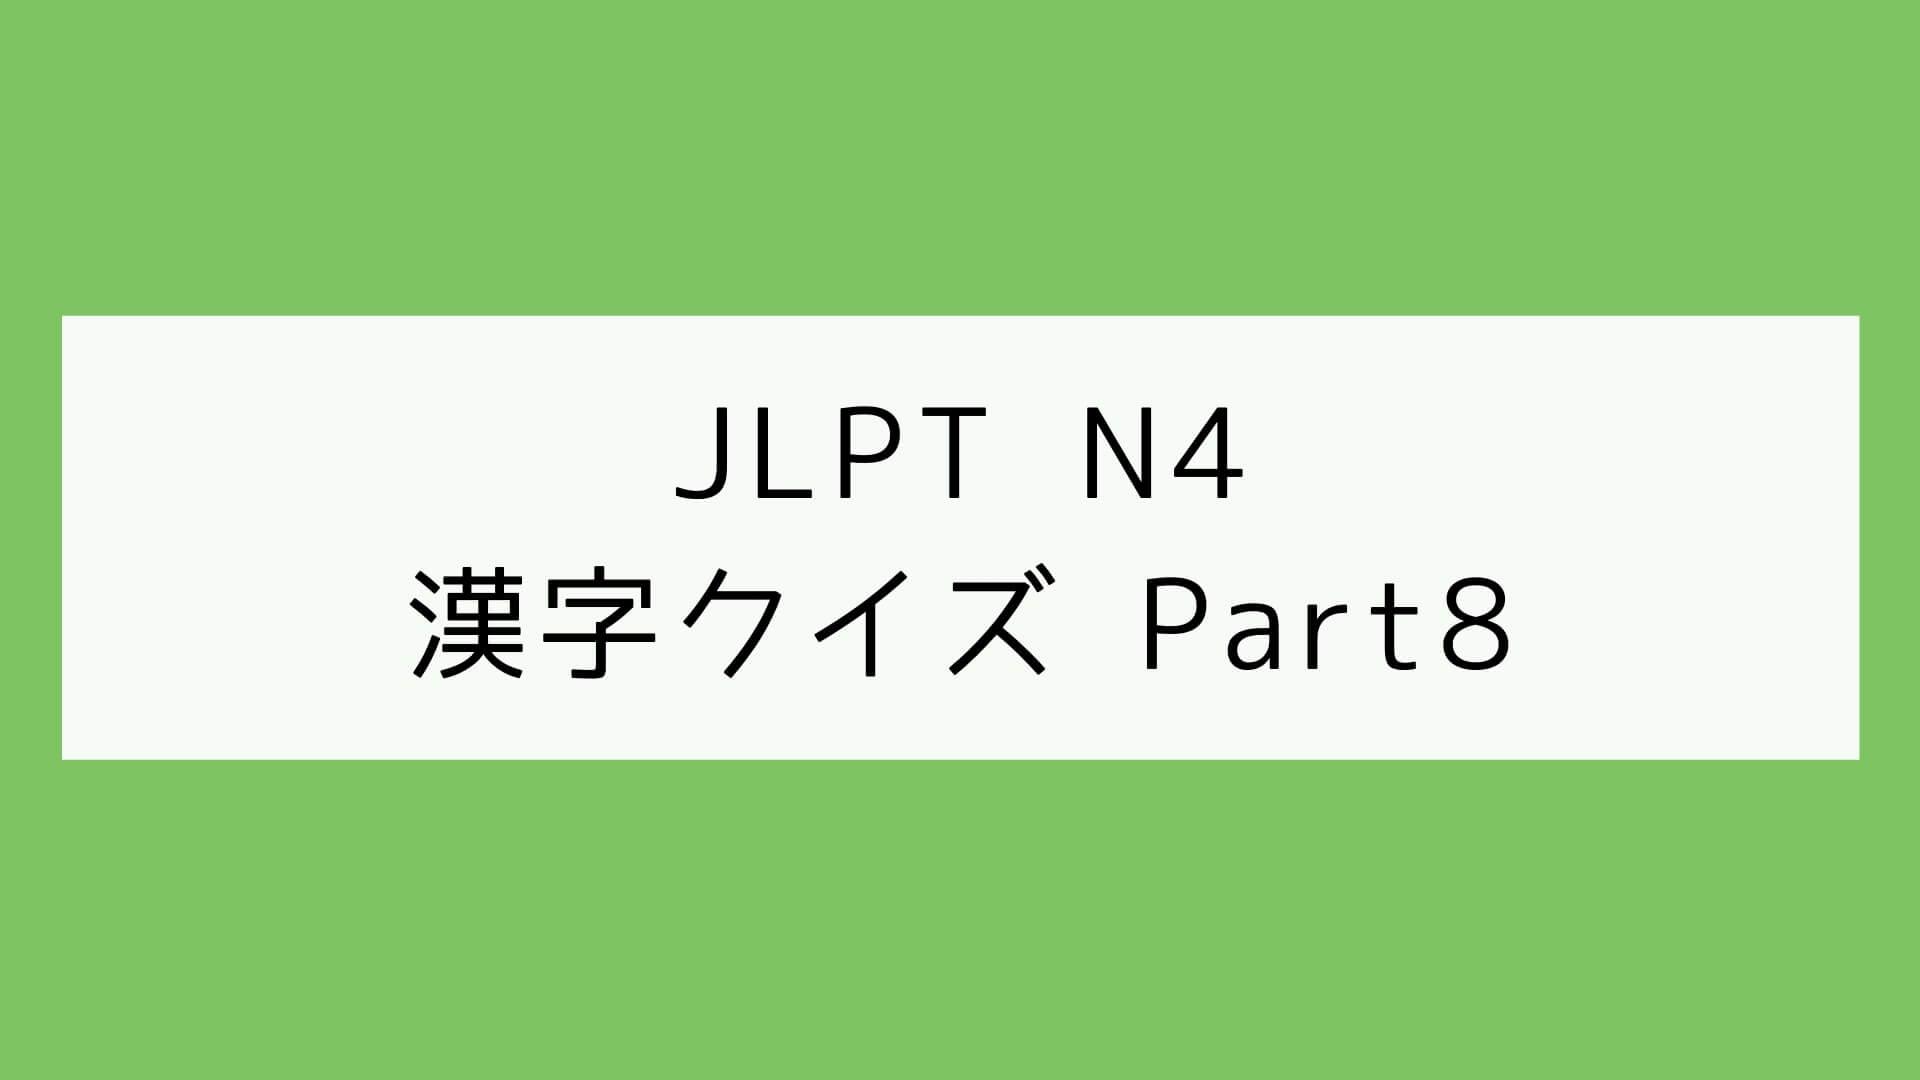 【JLPT N4】漢字クイズ Part8